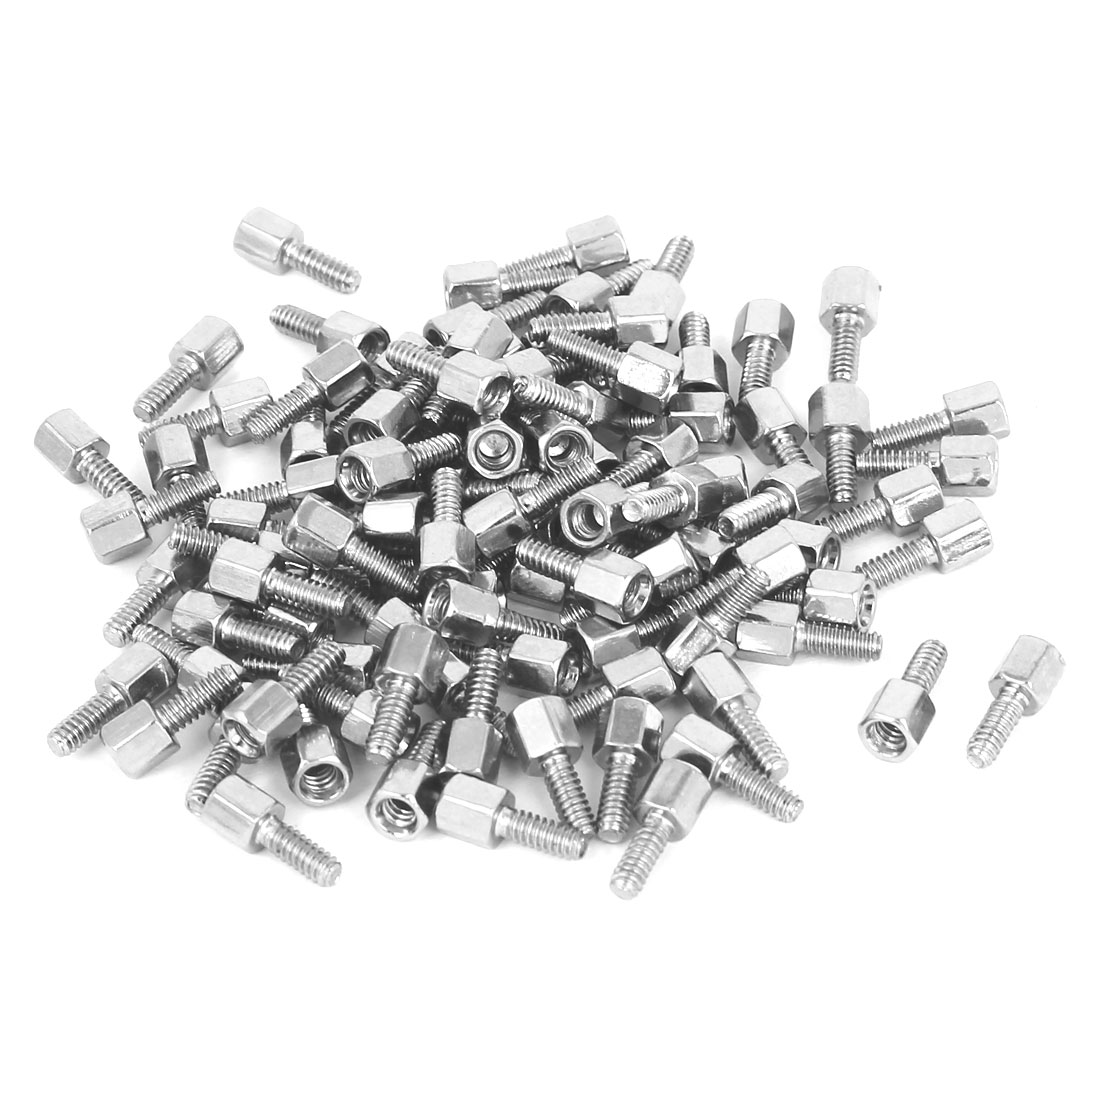 M3x5mm+7mm Male to Female Thread Brass Spacer Hexagonal Standoff Pillar 100pcs